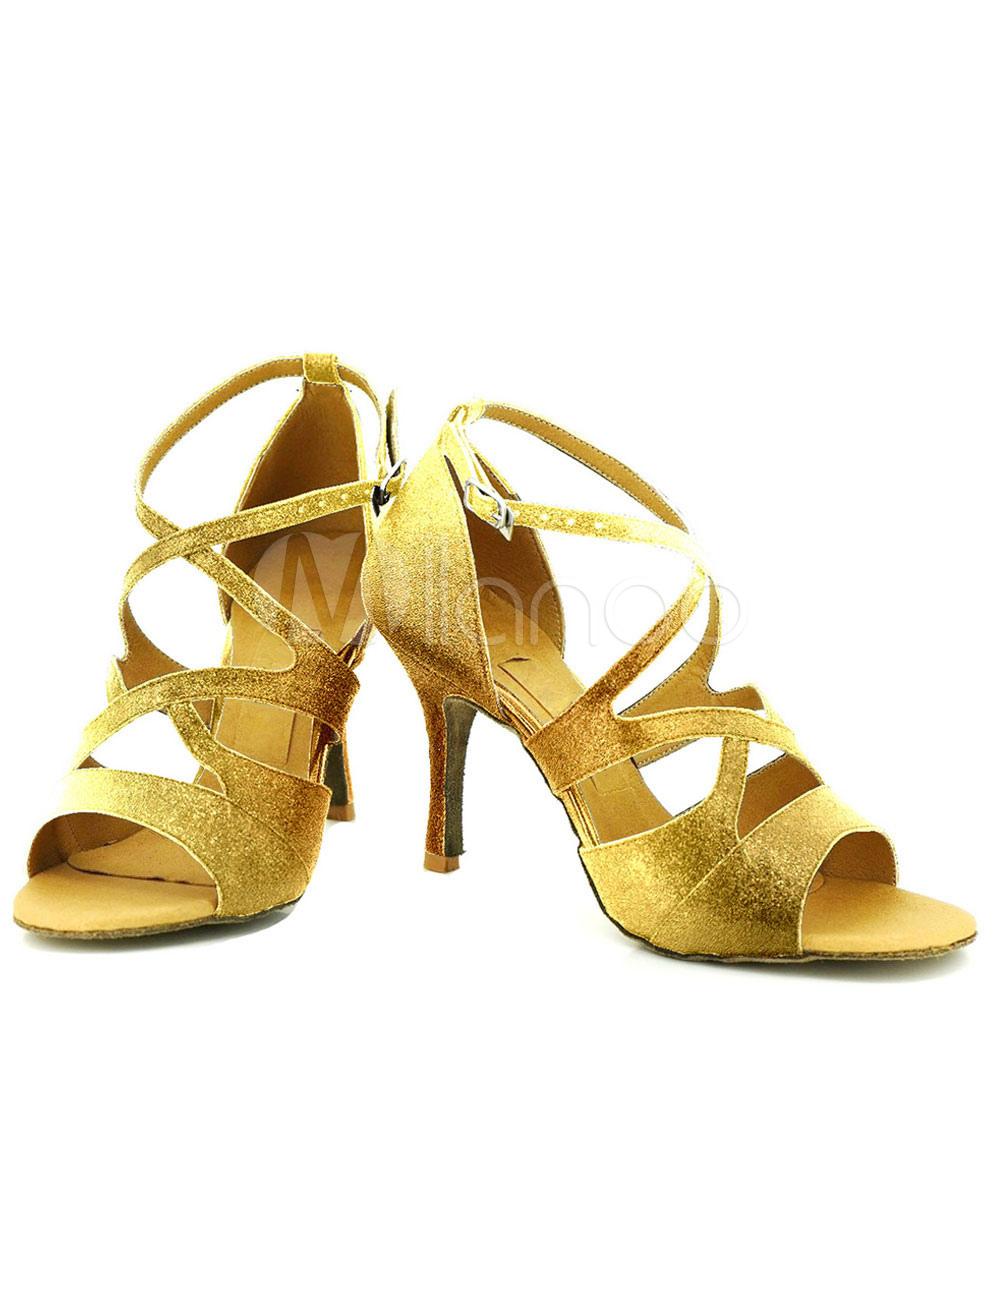 Baile zapatos del alto talón dos colores correa de las mujeres modificado para requisitos particulares zapatos de salón de baile rjqpE2